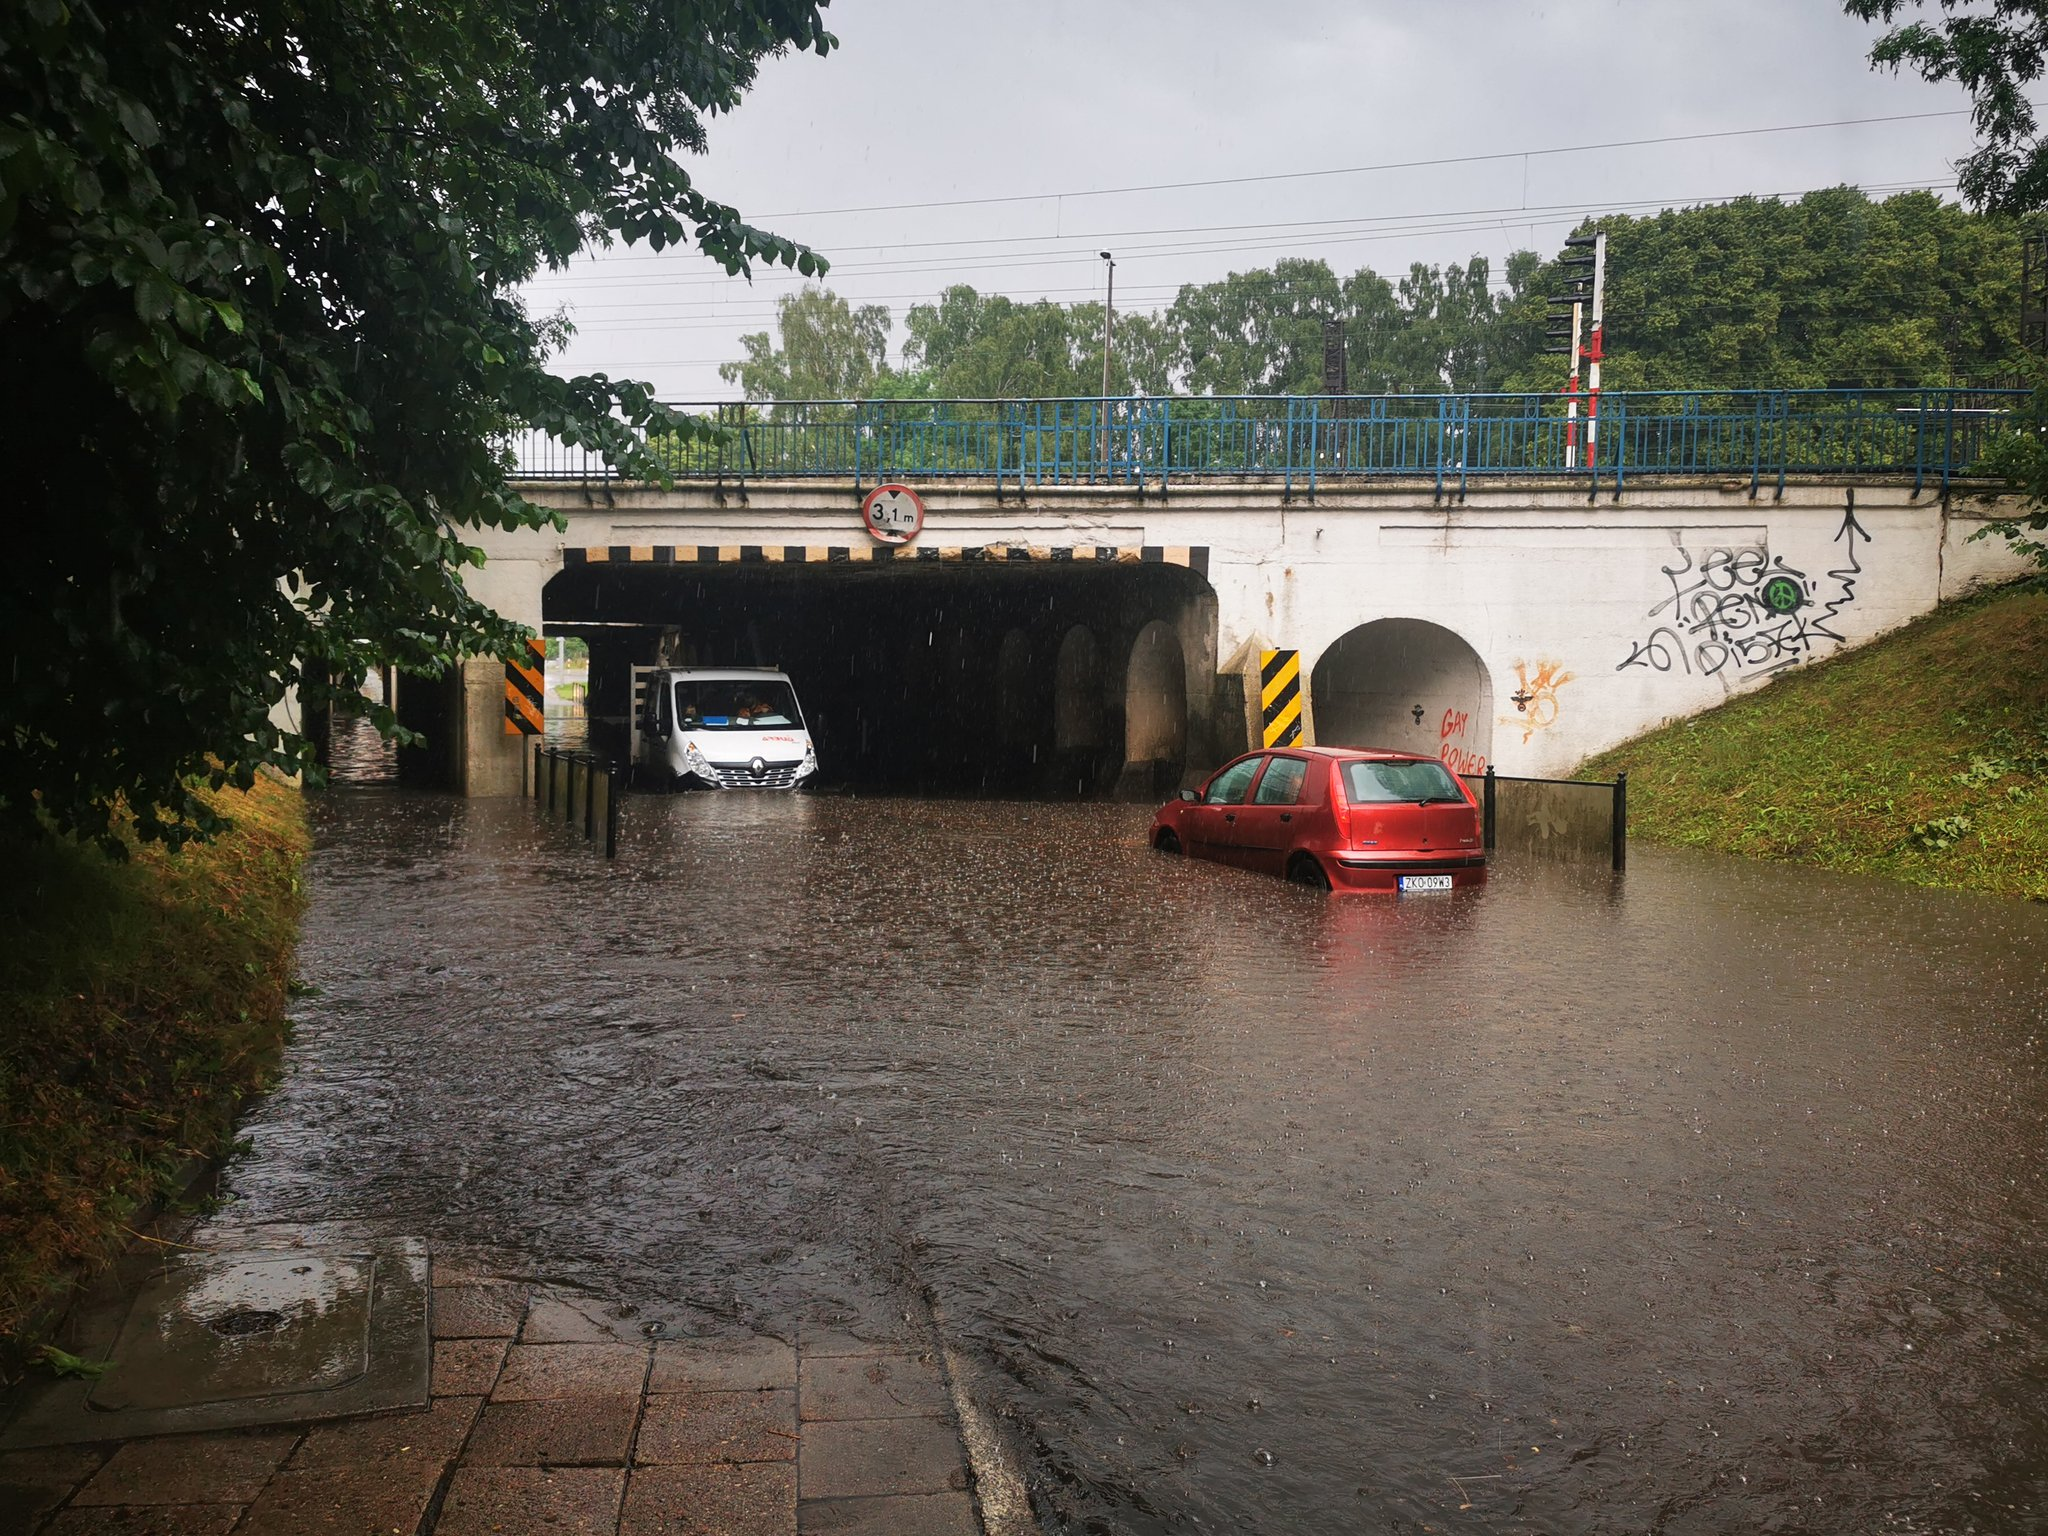 Burza Koszalin